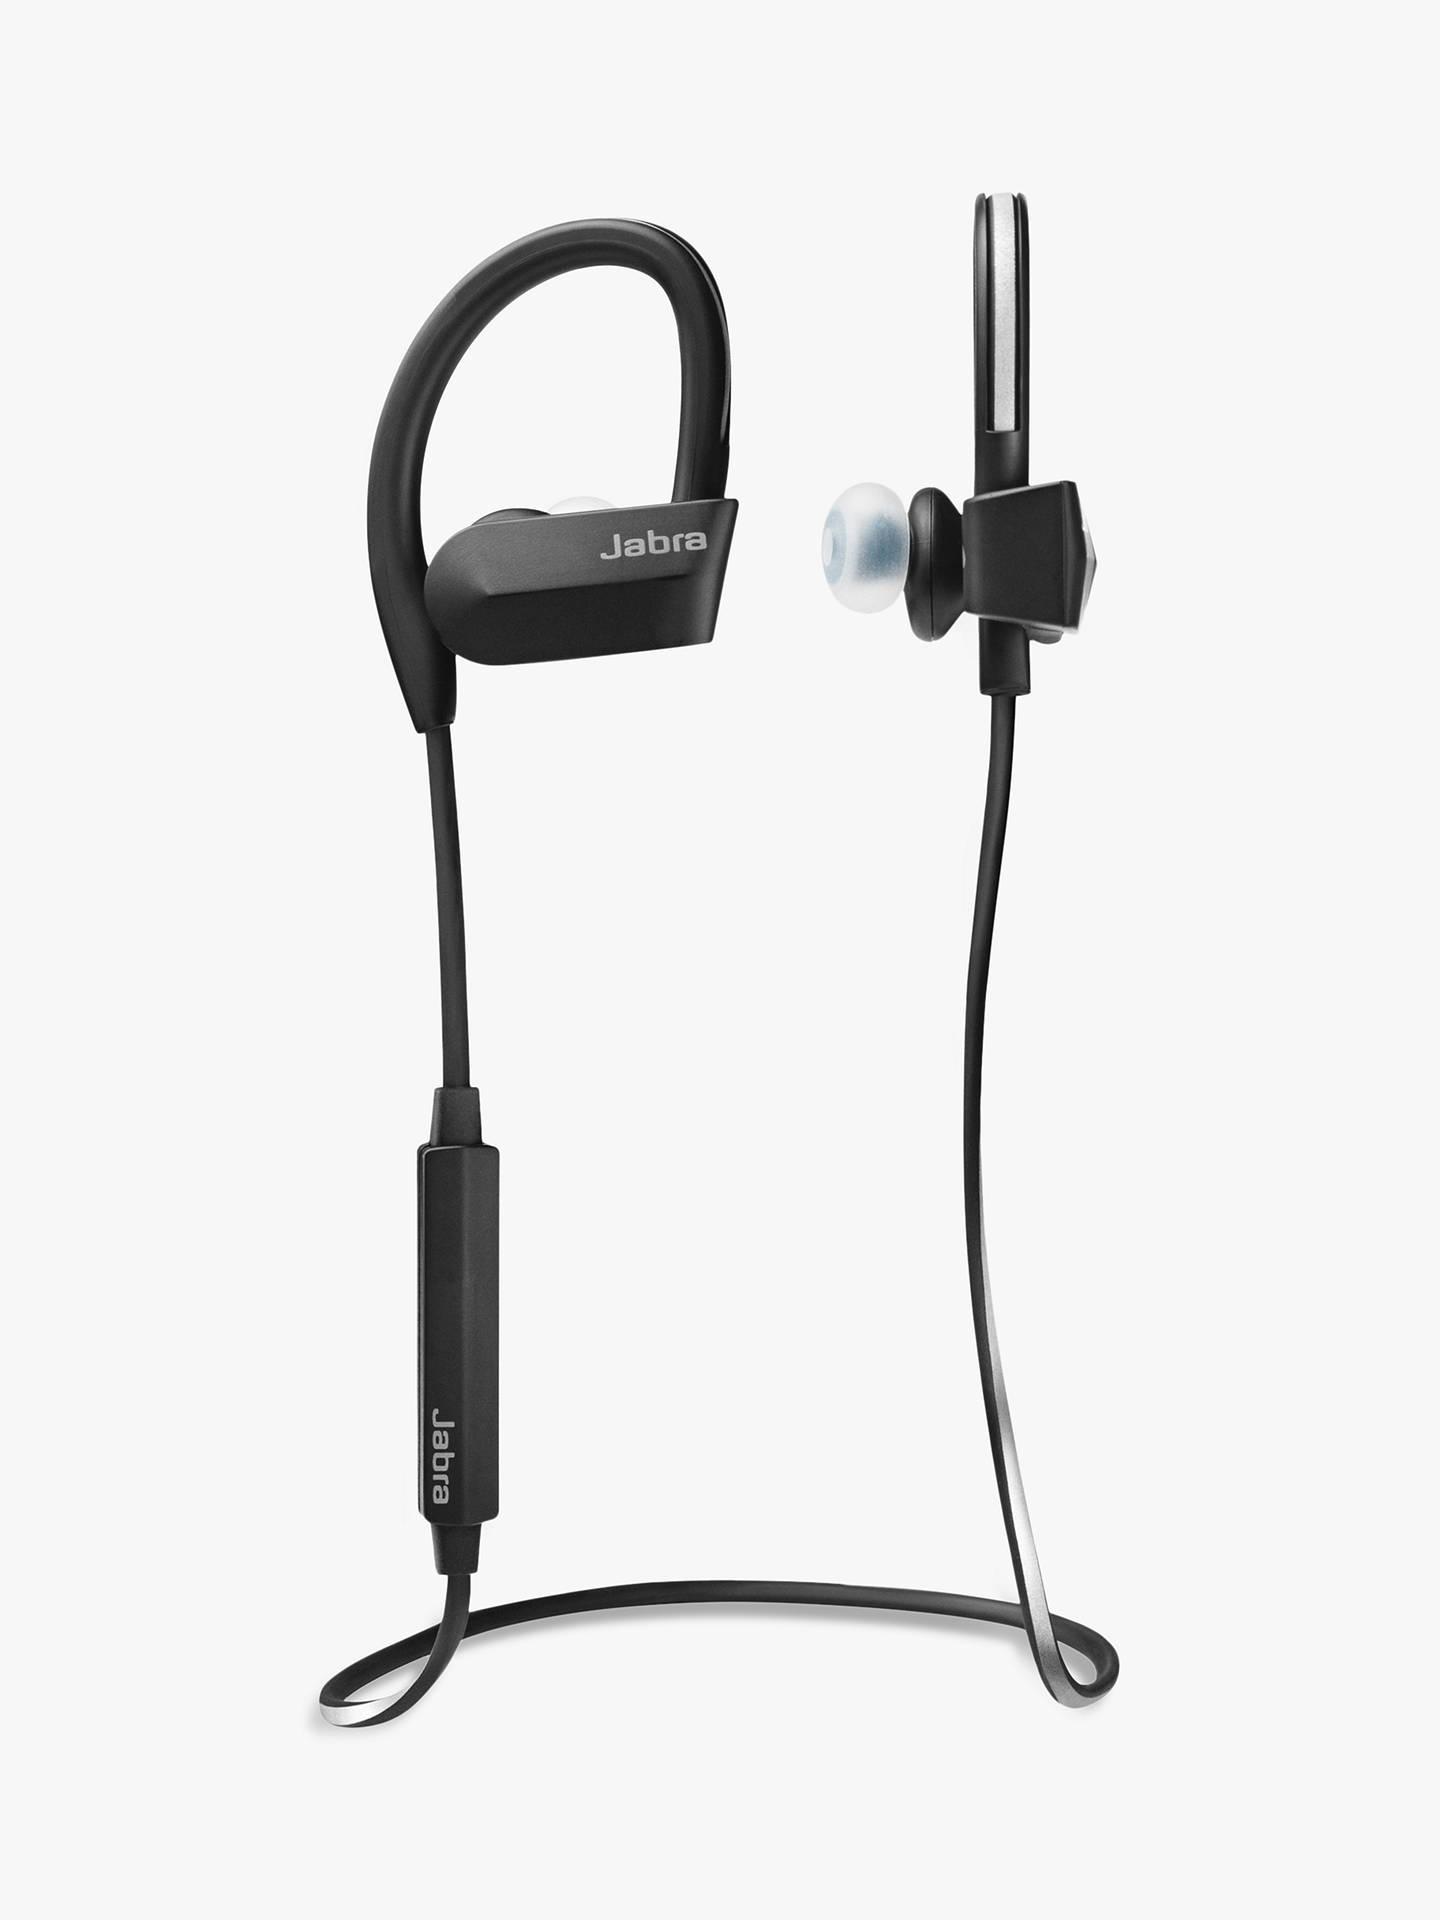 Jabra Sport Pace Sweat Weather Resistant Bluetooth In Ear Wireless Earbuds Blue Buyjabra Headphones With Mic